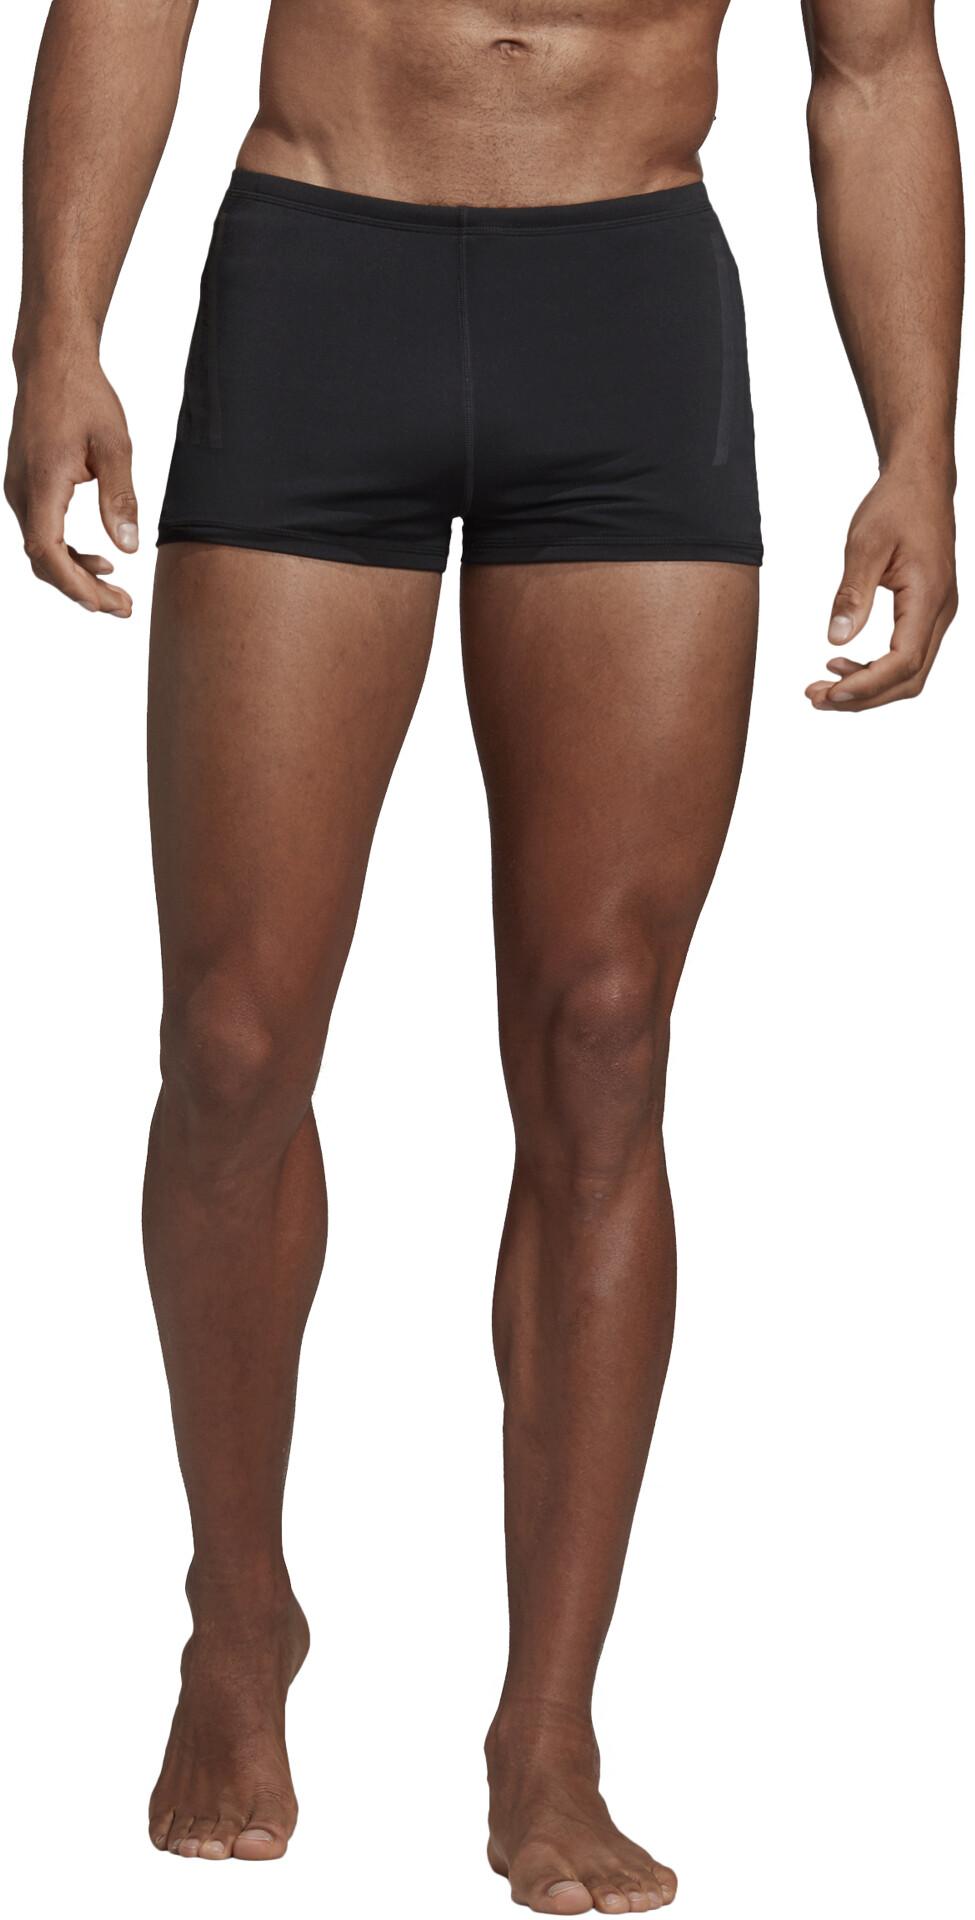 7f6d289e452253 adidas Pro 3-Stripes Zwemboxers Heren, black/carbon I Eenvoudig ...